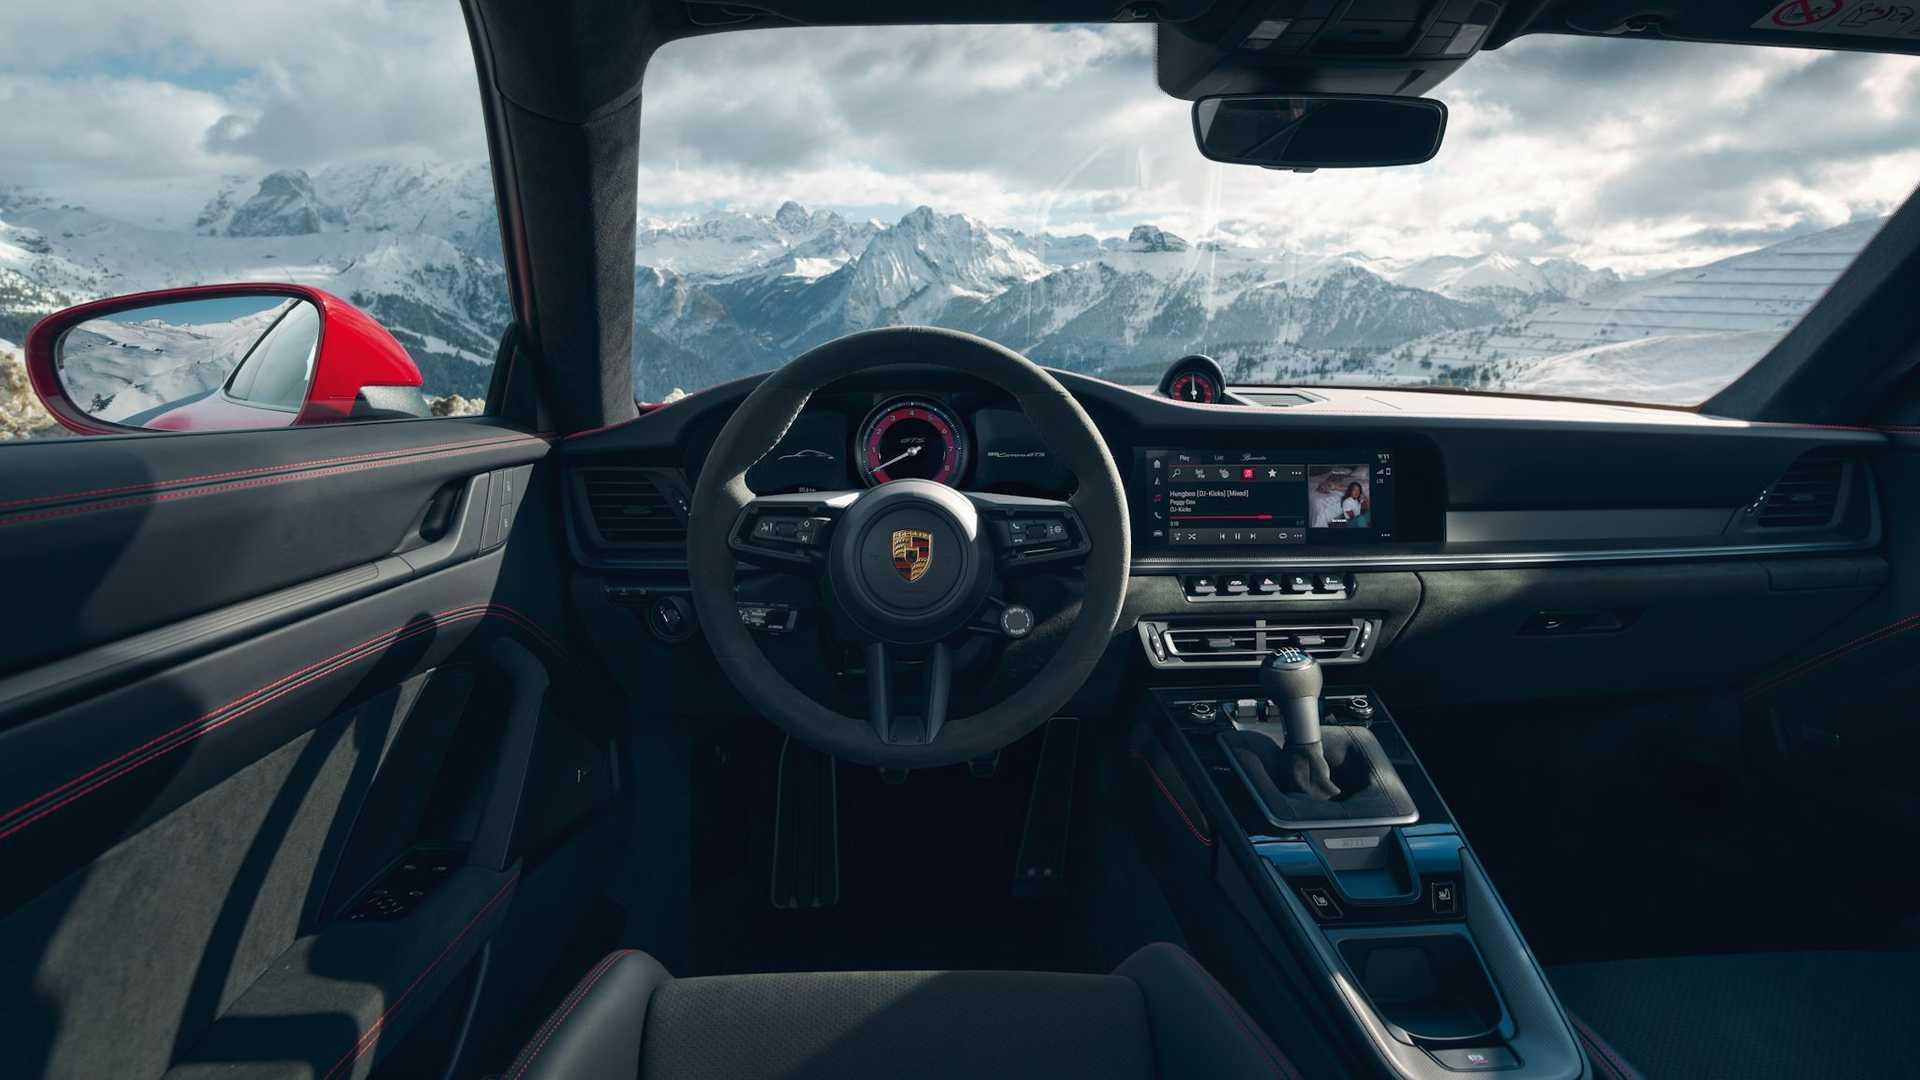 2022 Porsche 911 Carrera Gts Interior (1)